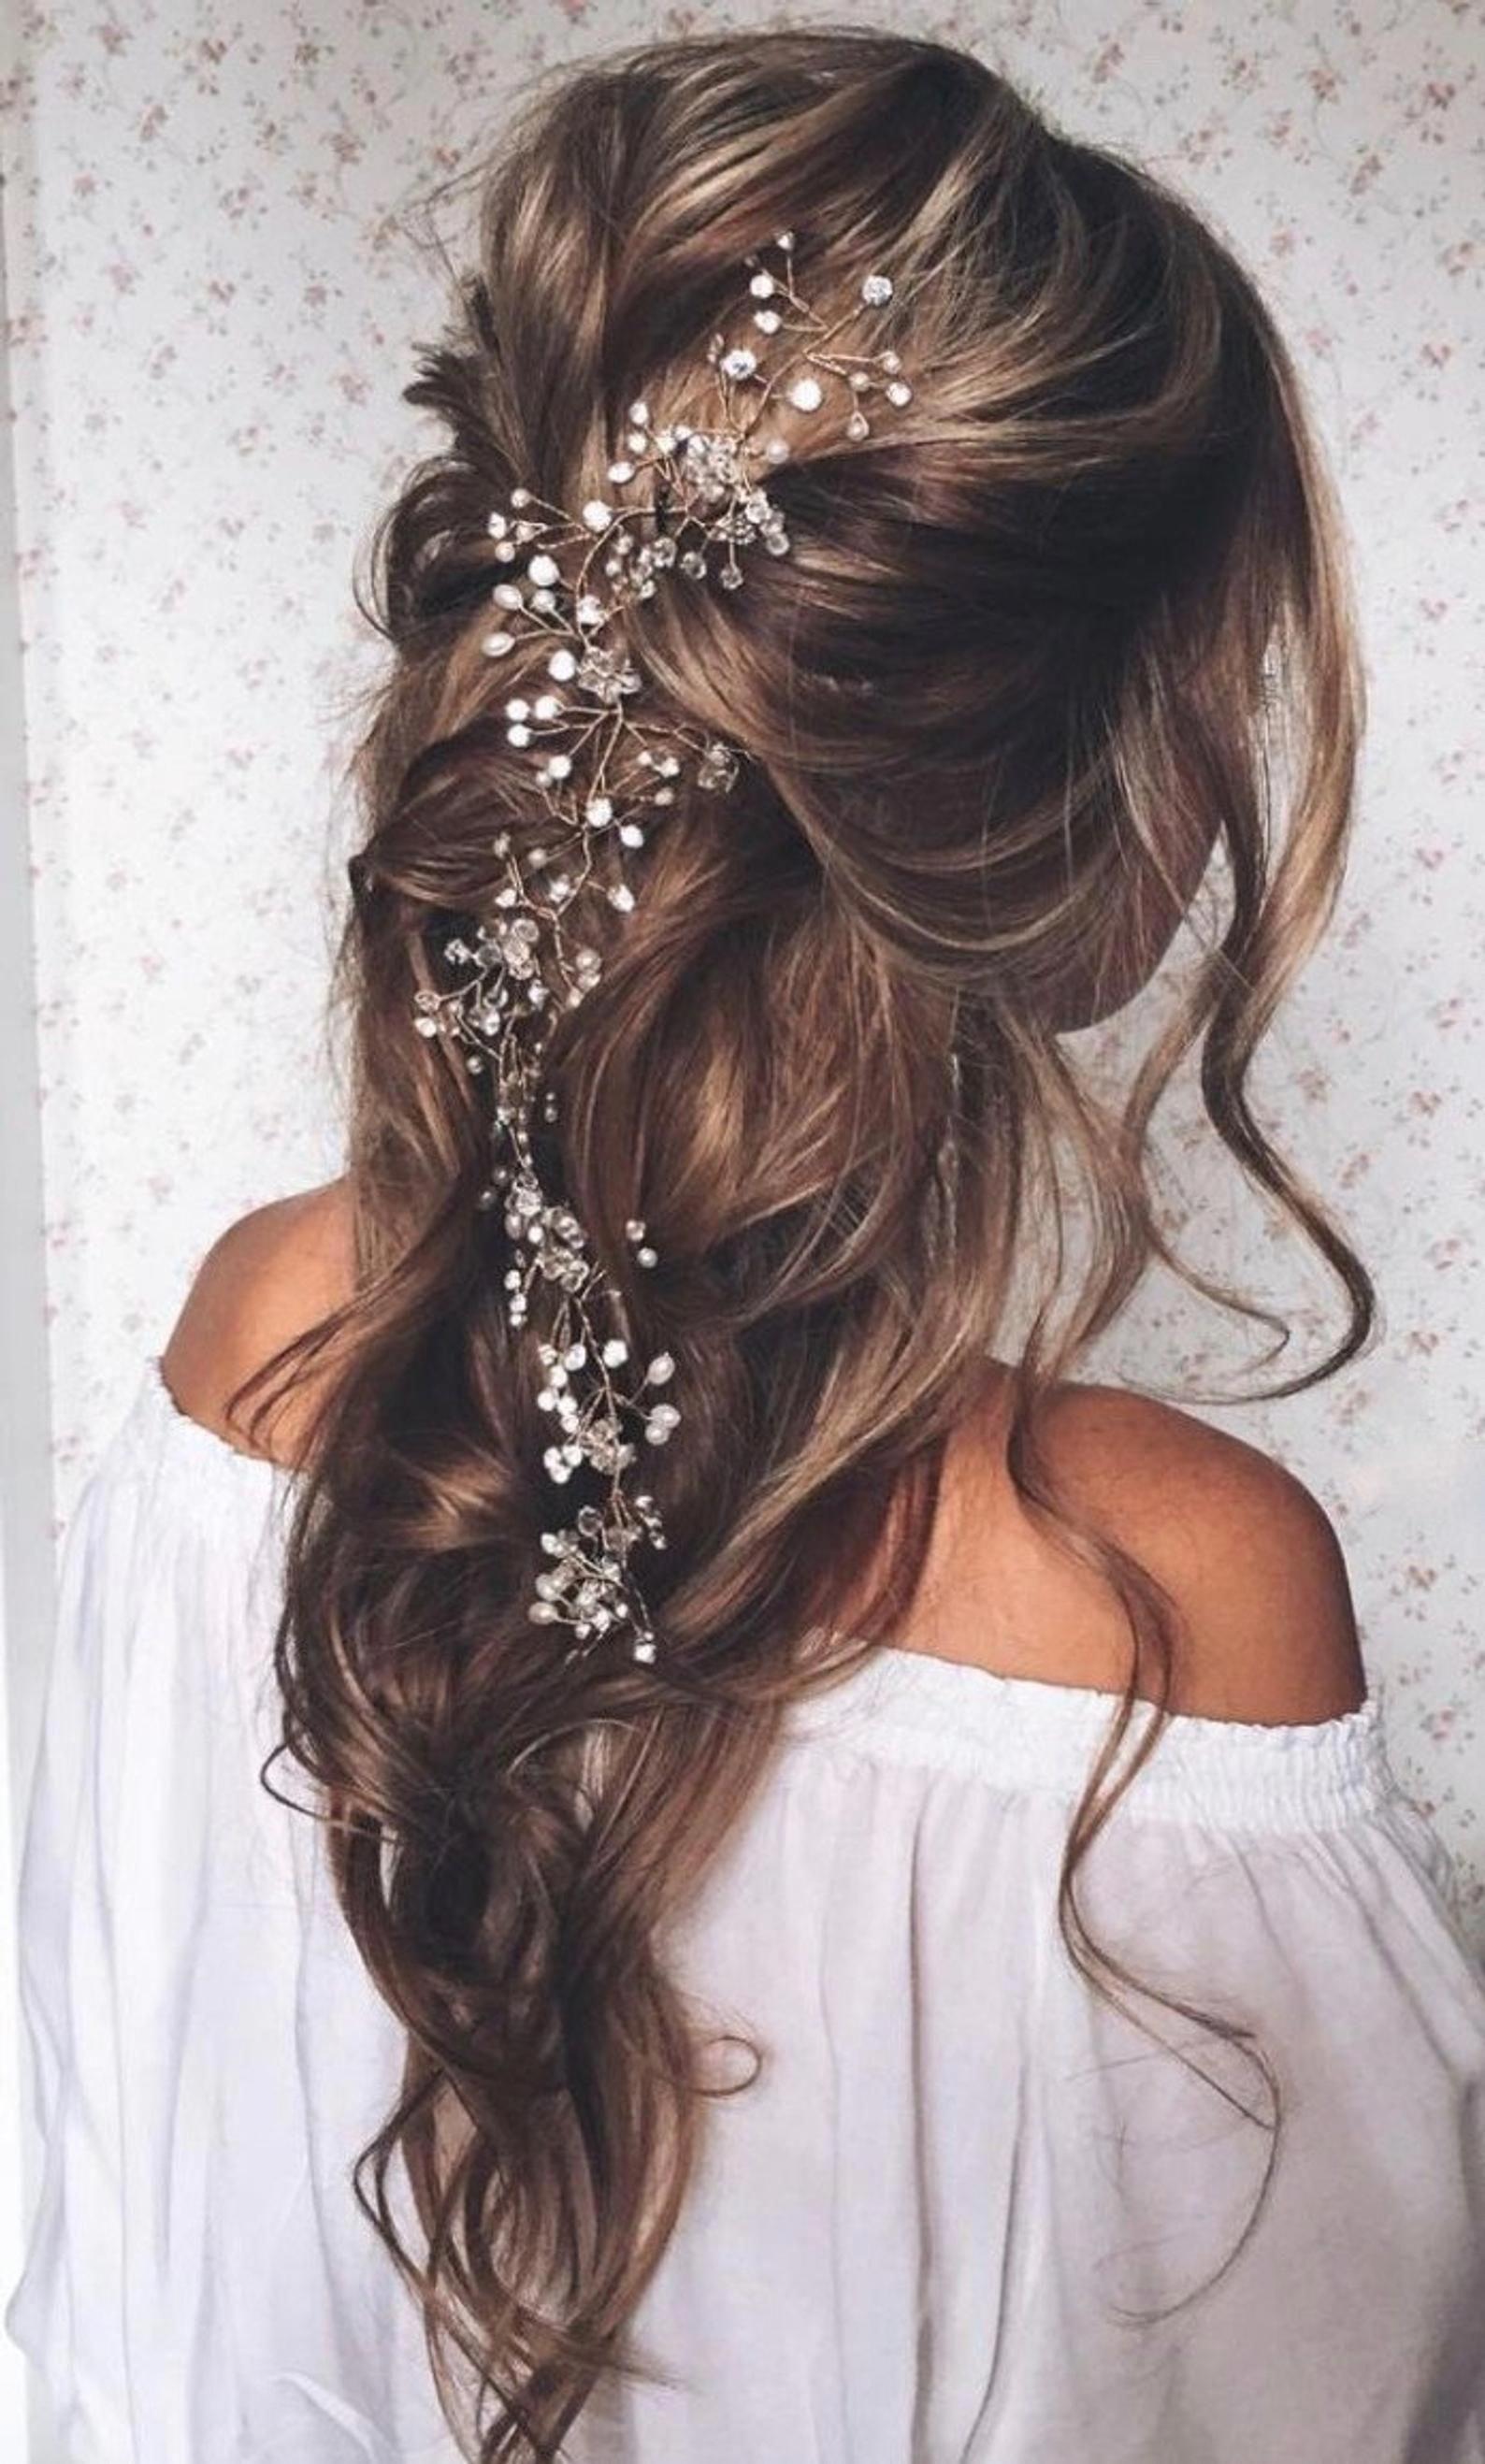 Bridal Hair Vine Wedding Hair vine Wedding Hair Accessories Bridal hair accessories Rose gold Bridal Hair vine Silver Bridal Hair Vine